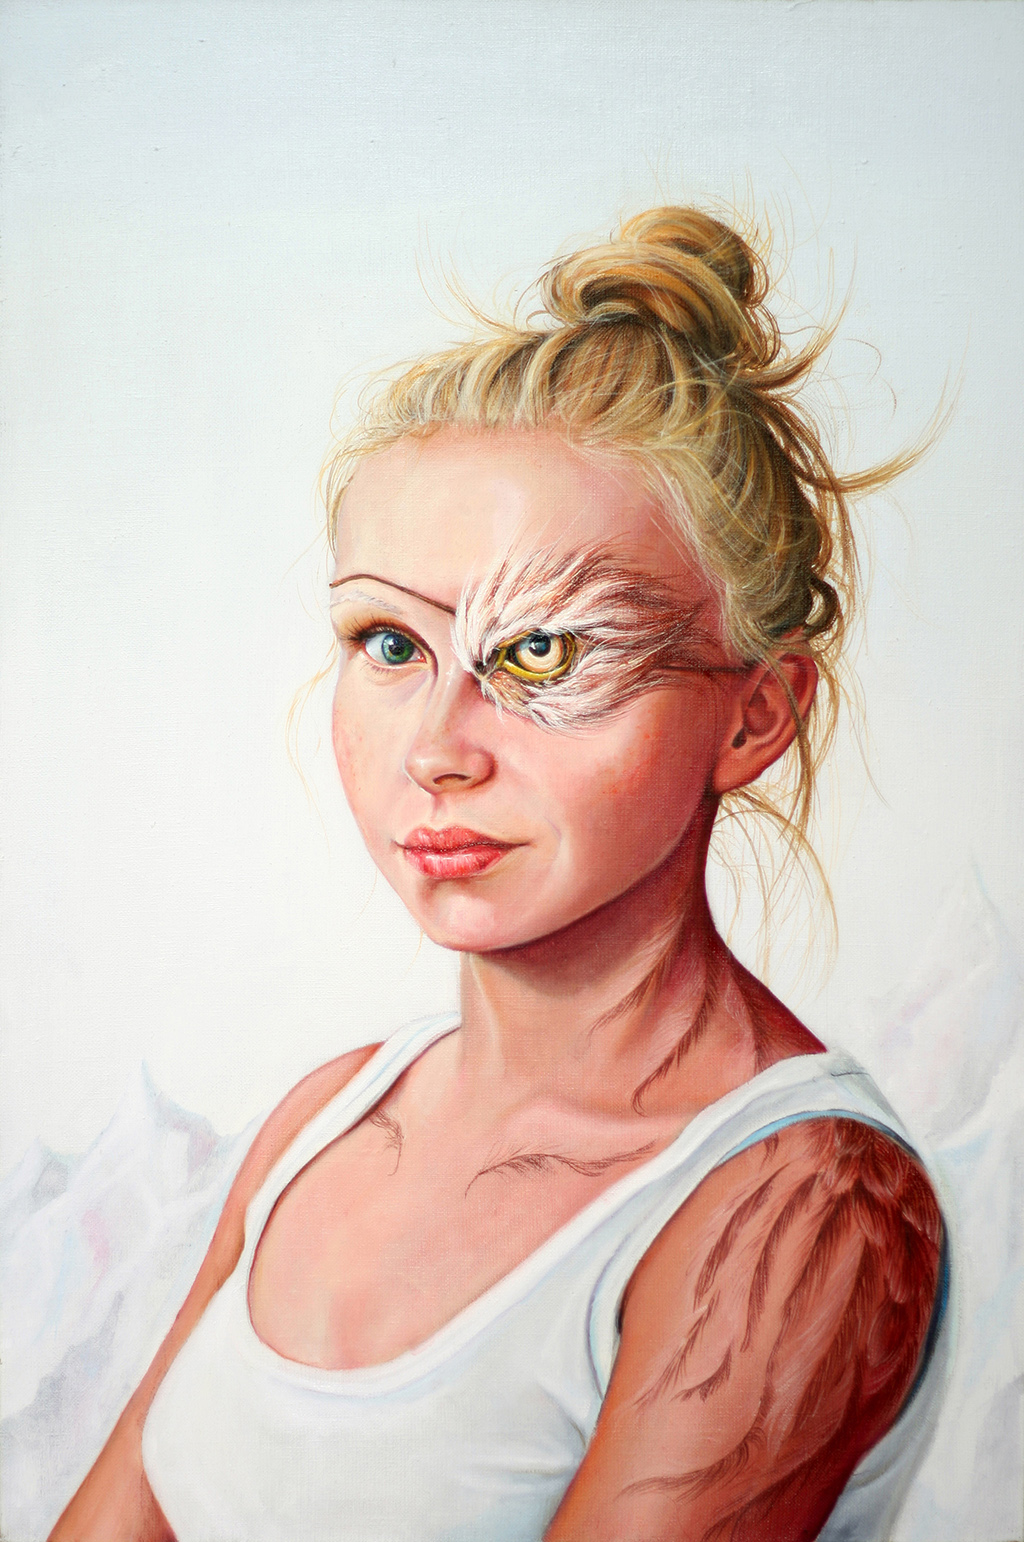 Ewa-Pronczuk-Kuziak-See-more-olej-na-płótnie-40x60cm-2014 - Kopie